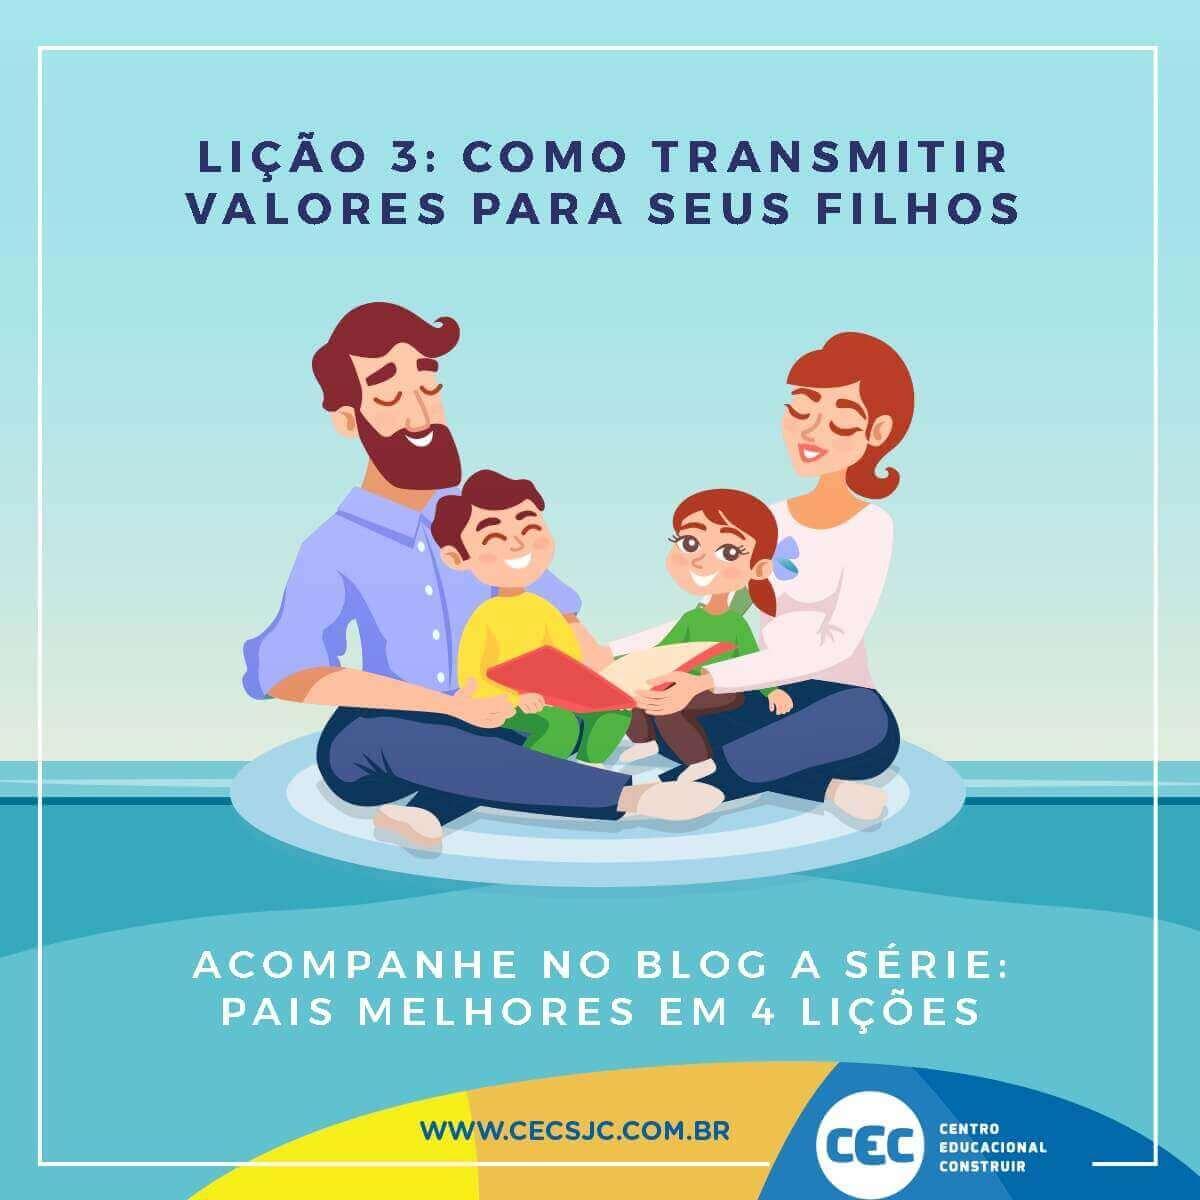 blog-hjjpeg-30052020102057.jpeg